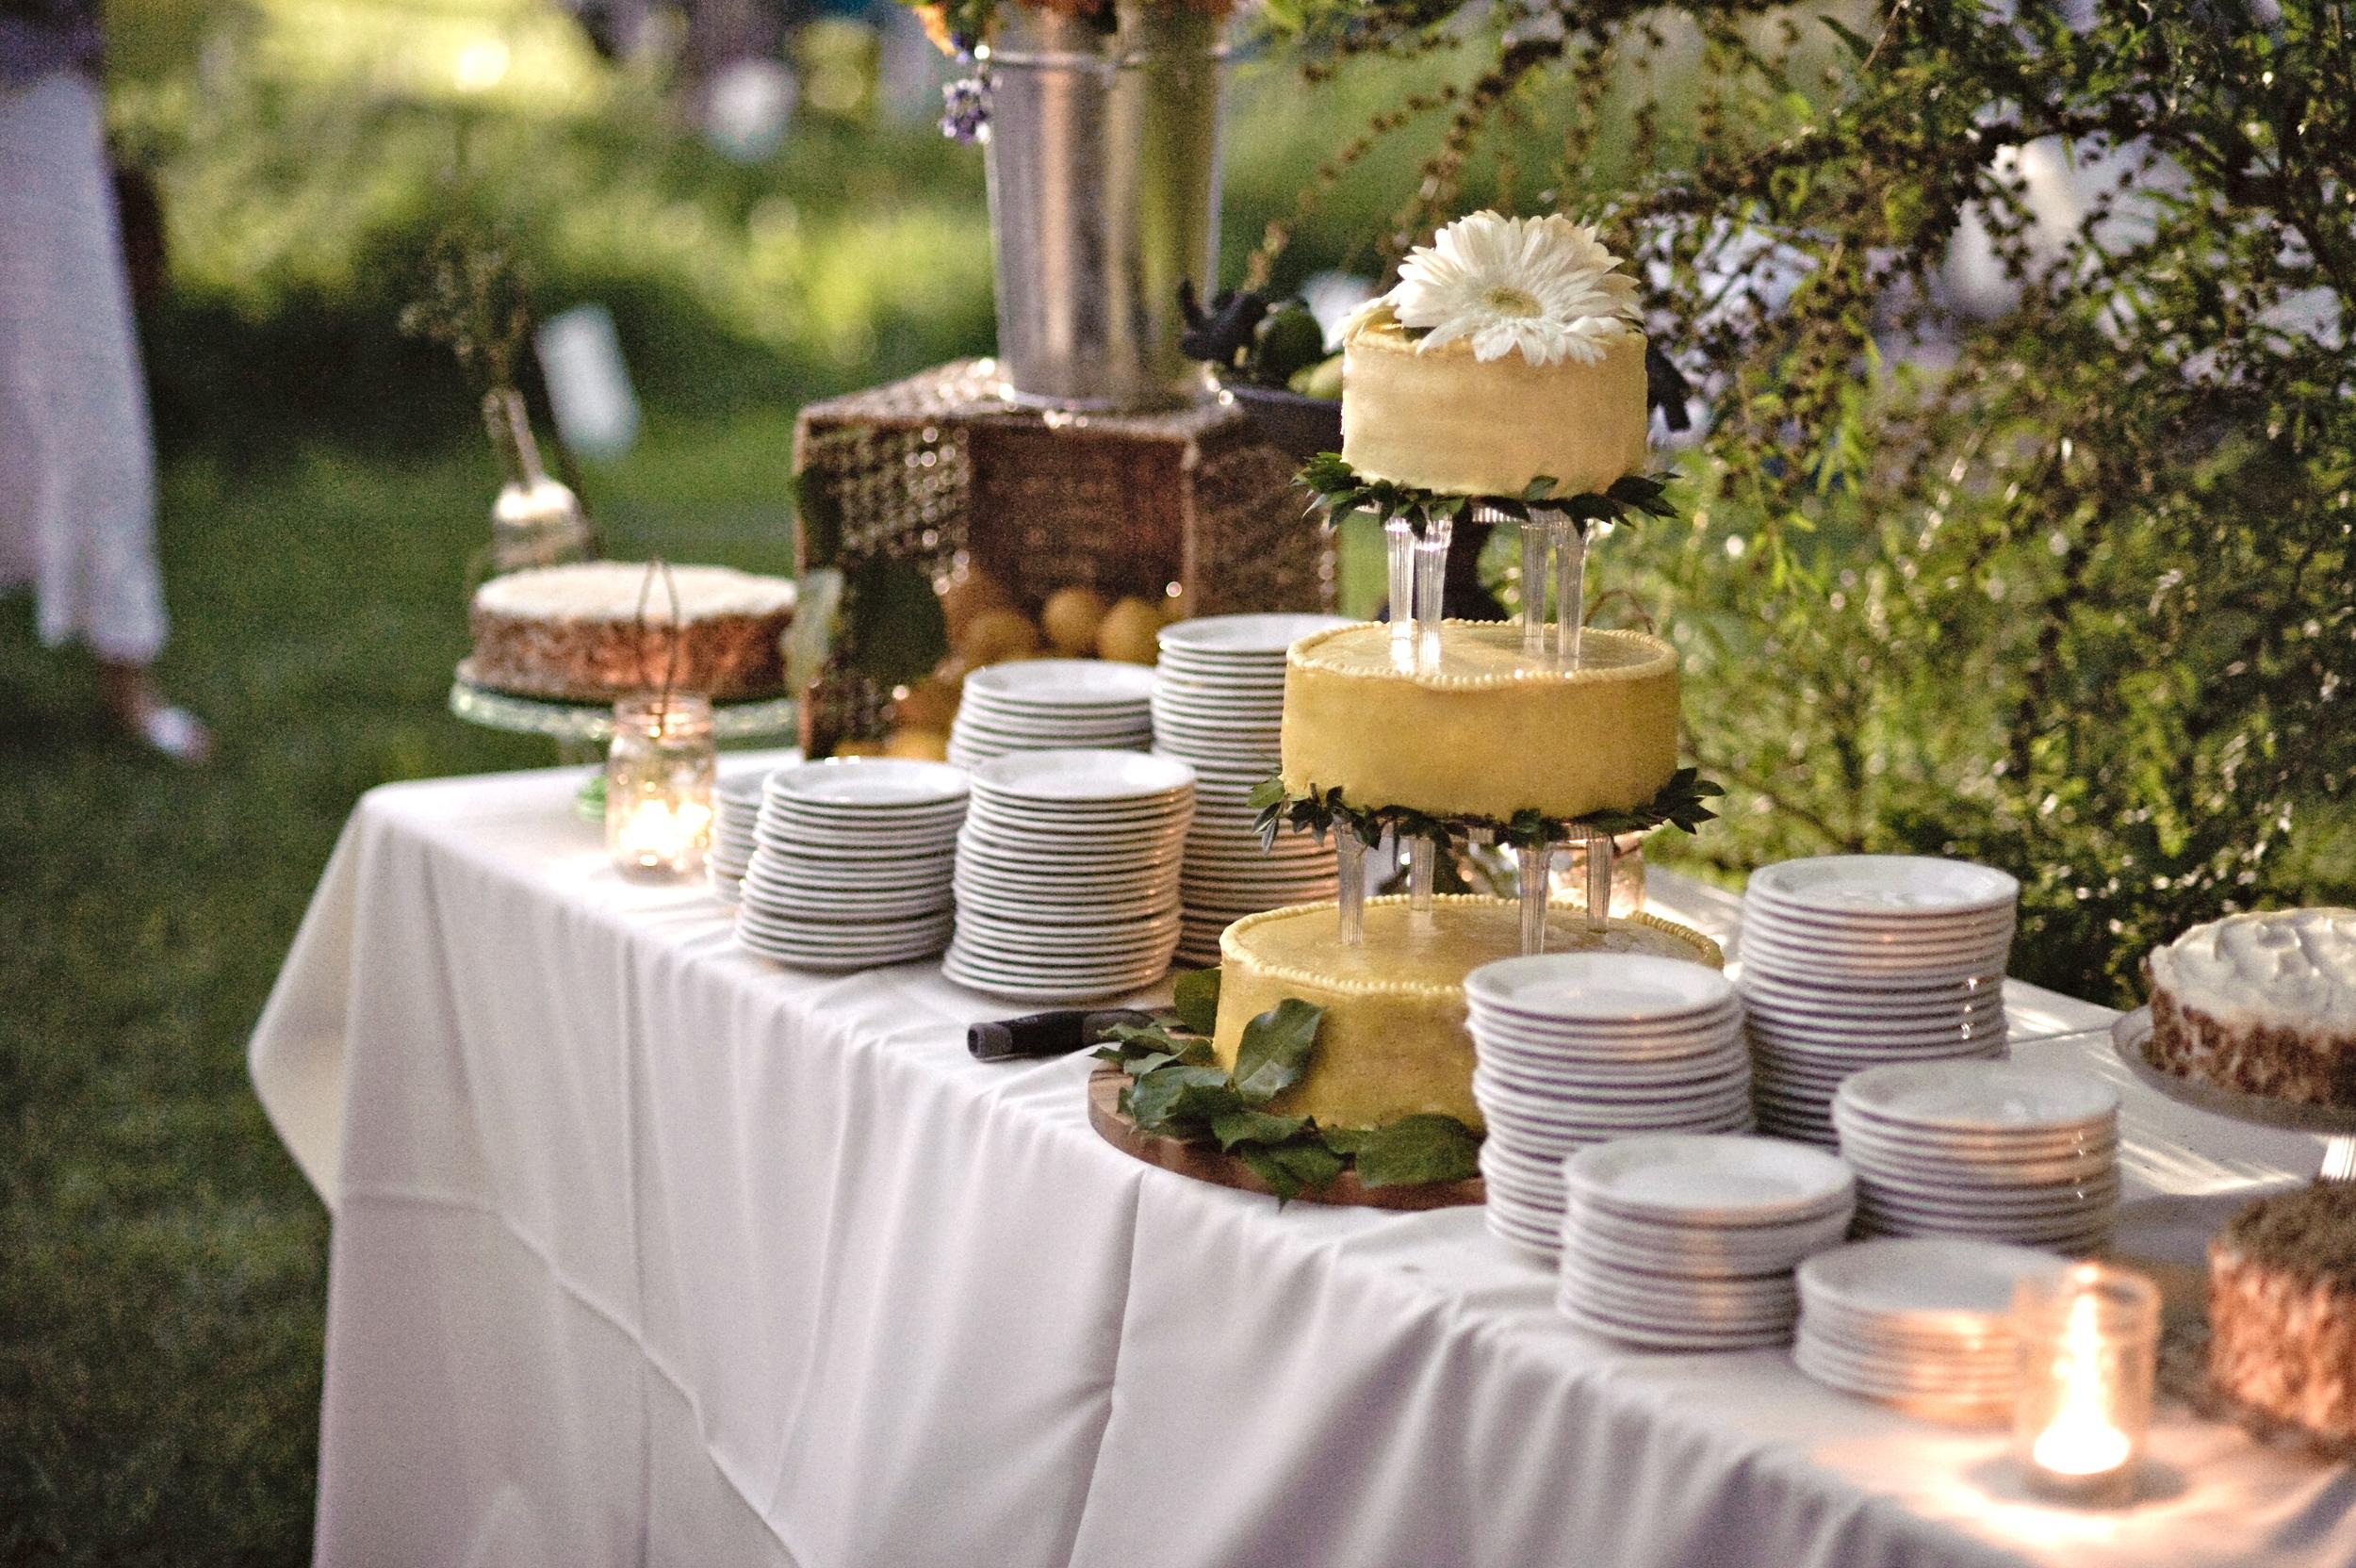 3-tiered Lemon Curd Wedding Cake